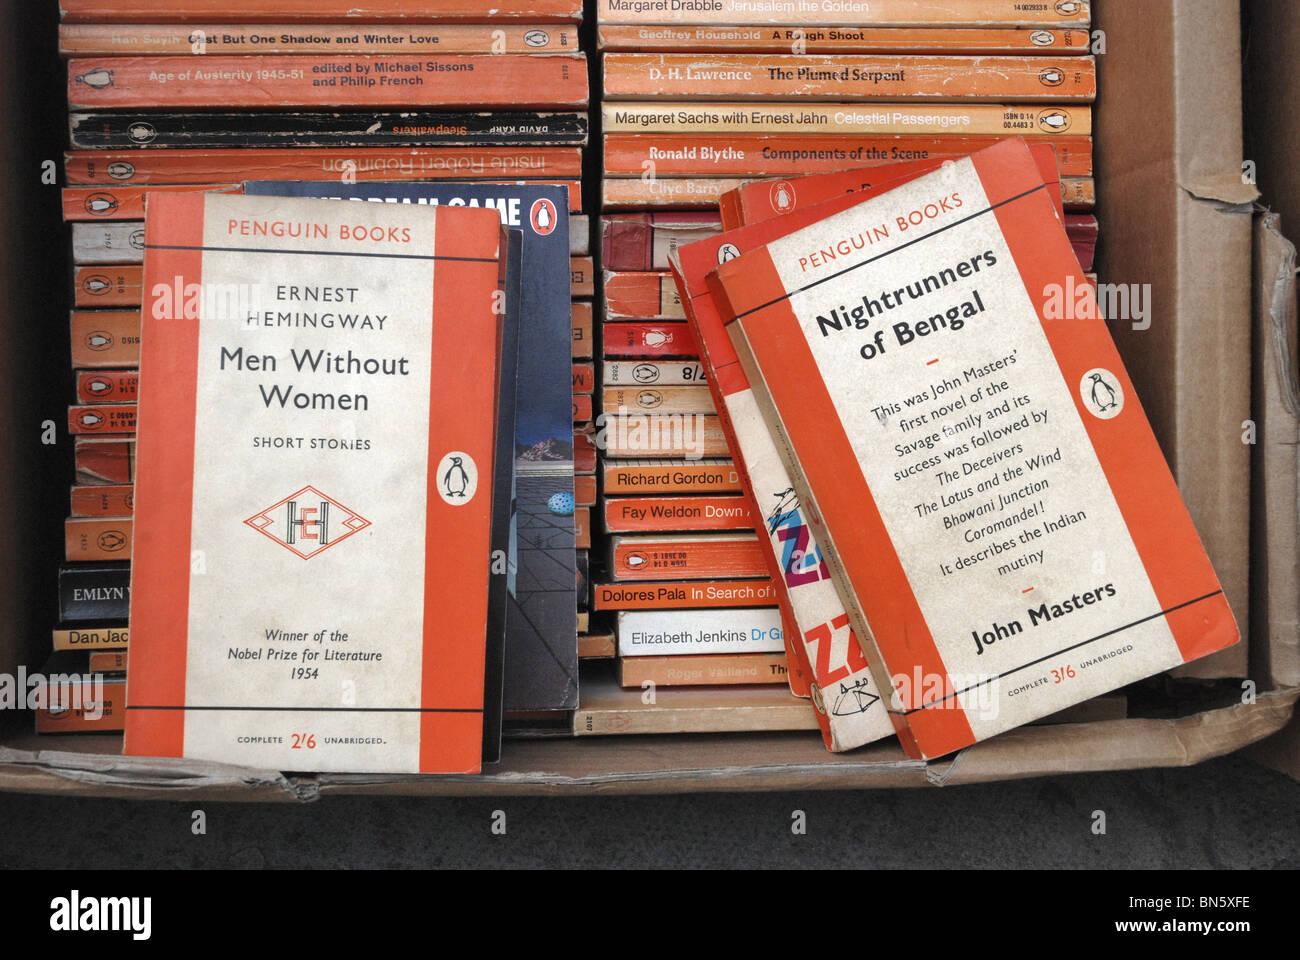 Penguin paperbacks at a secondhand bookshop in Edinburgh. - Stock Image